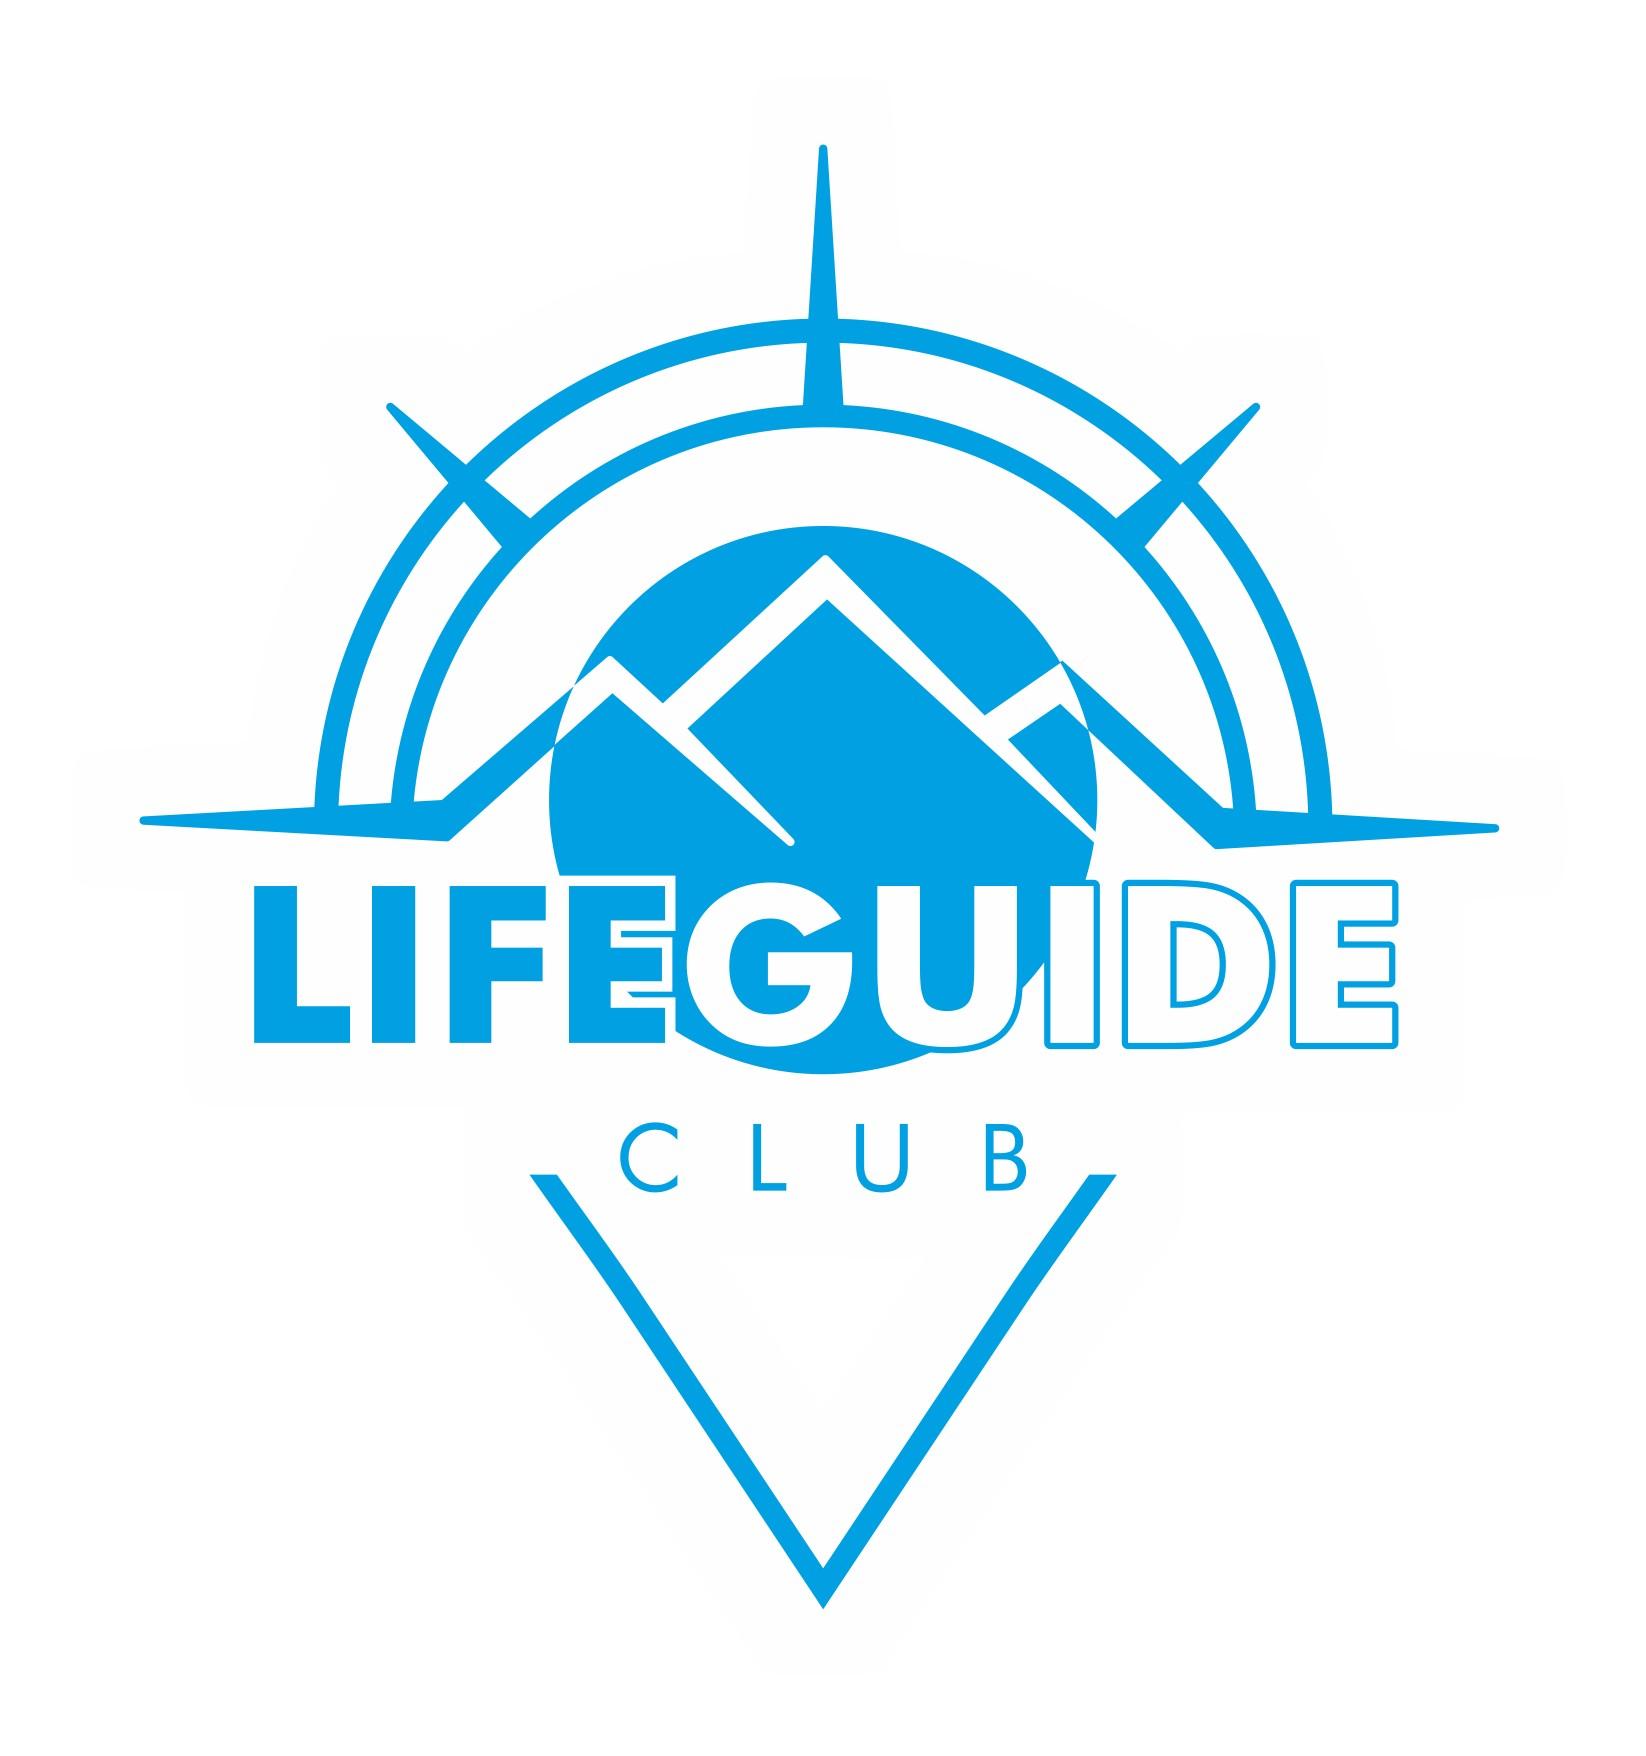 LifeGuide Club